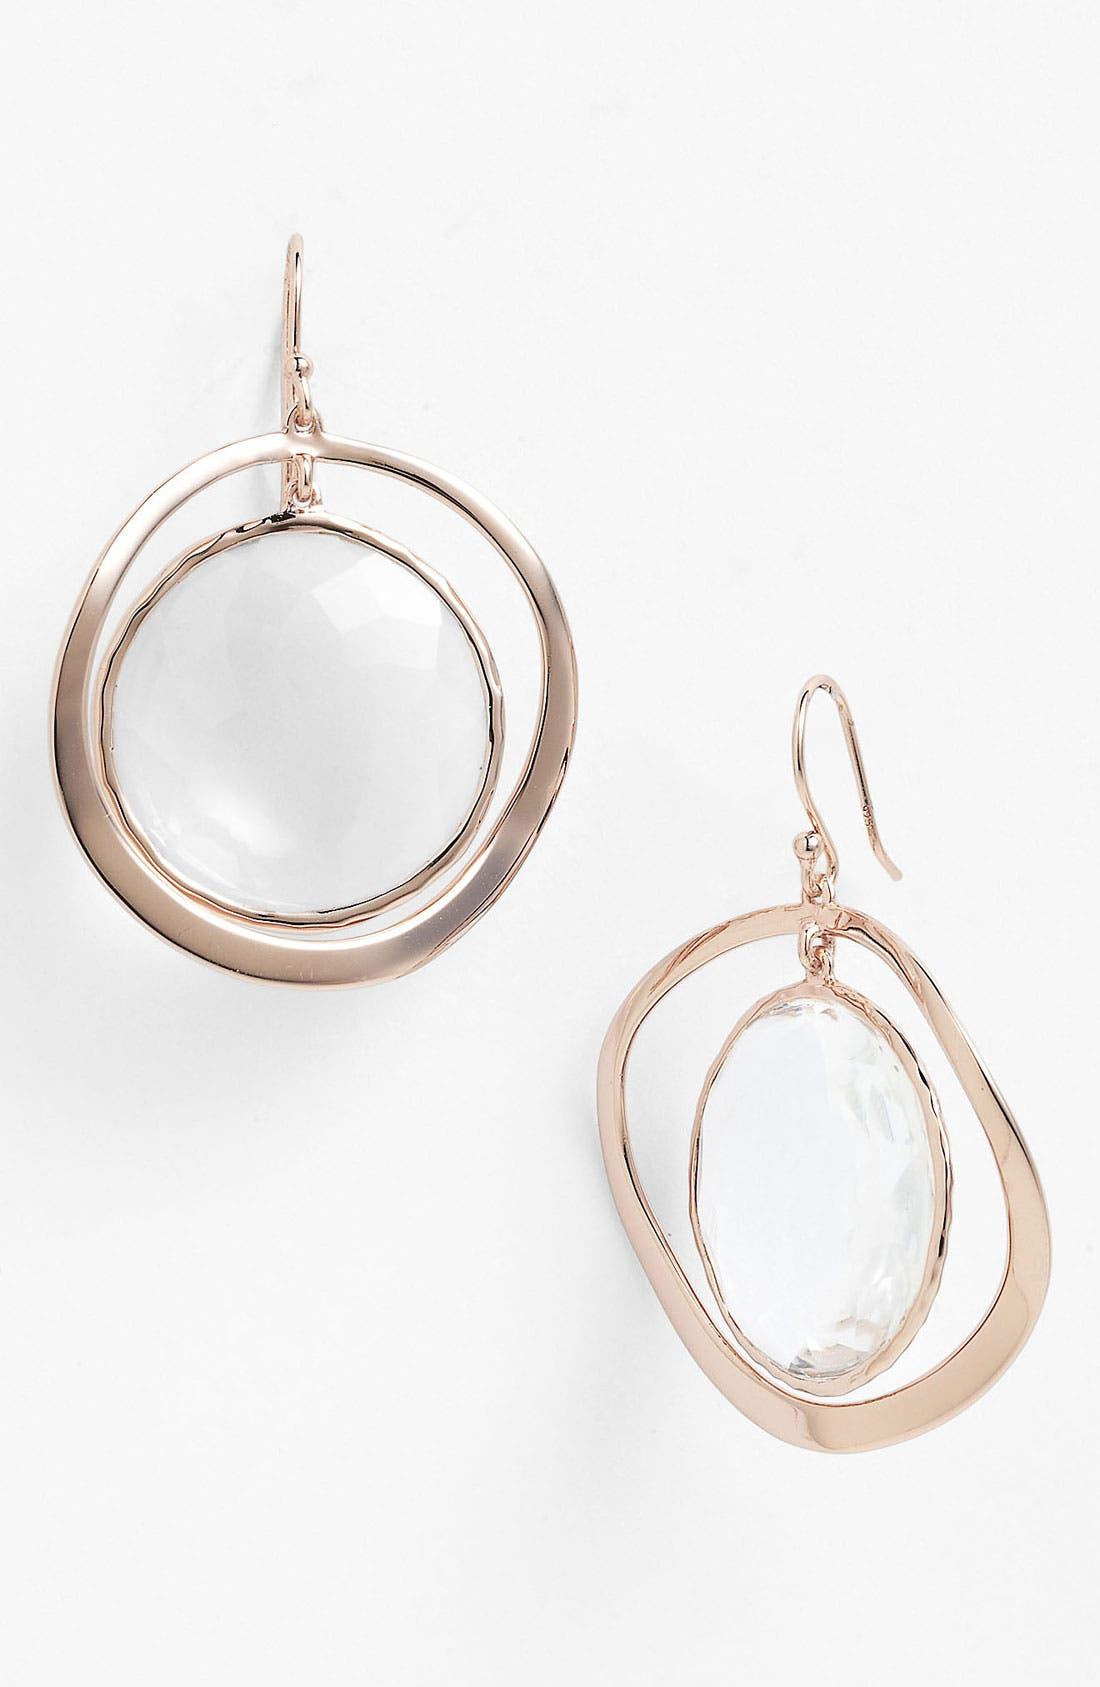 Main Image - Ippolita 'Lite Links' Round Stone Drop Earrings